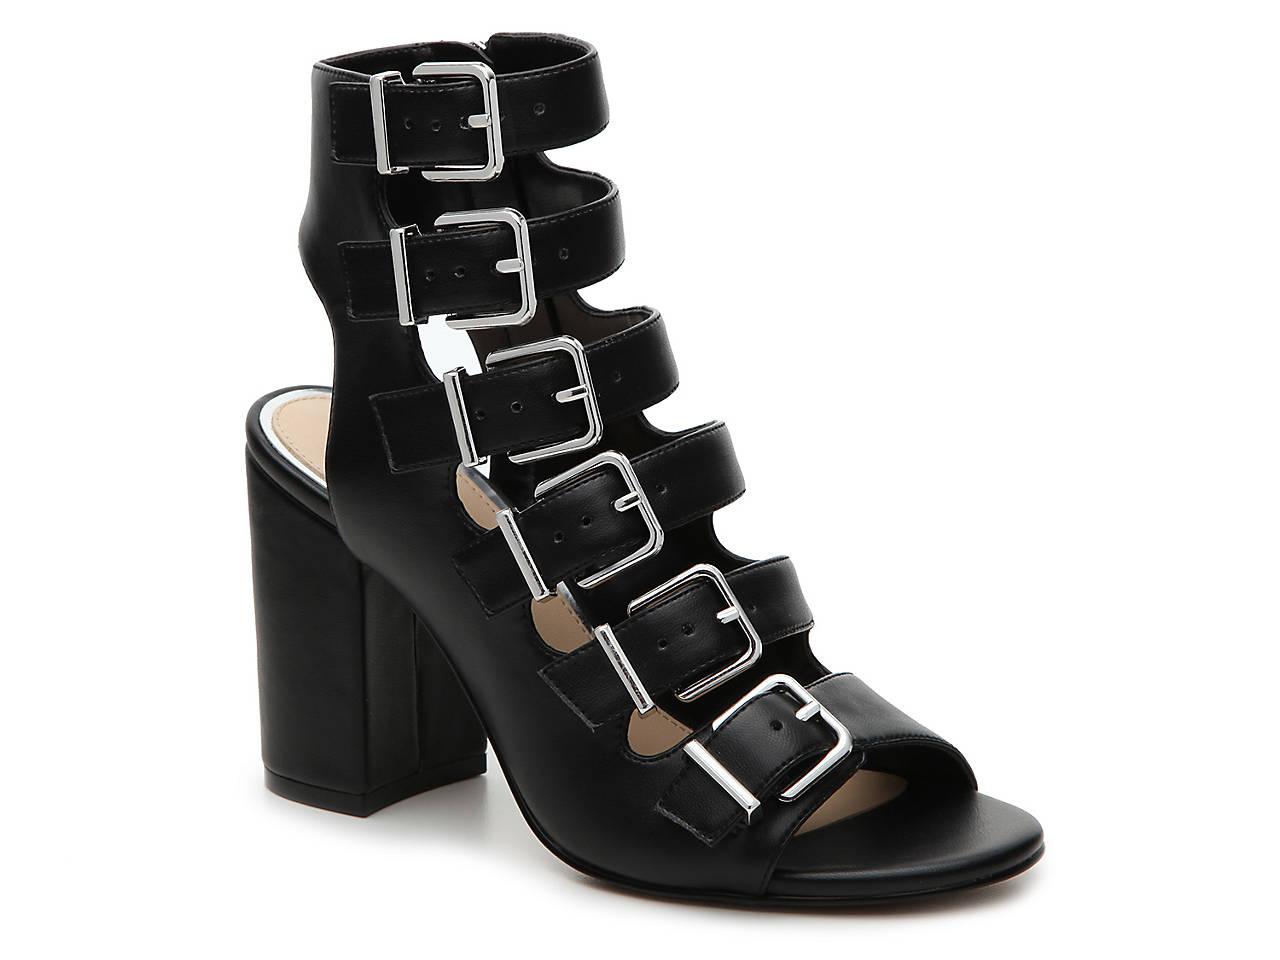 Black sandals at dsw - Tyann Sandal